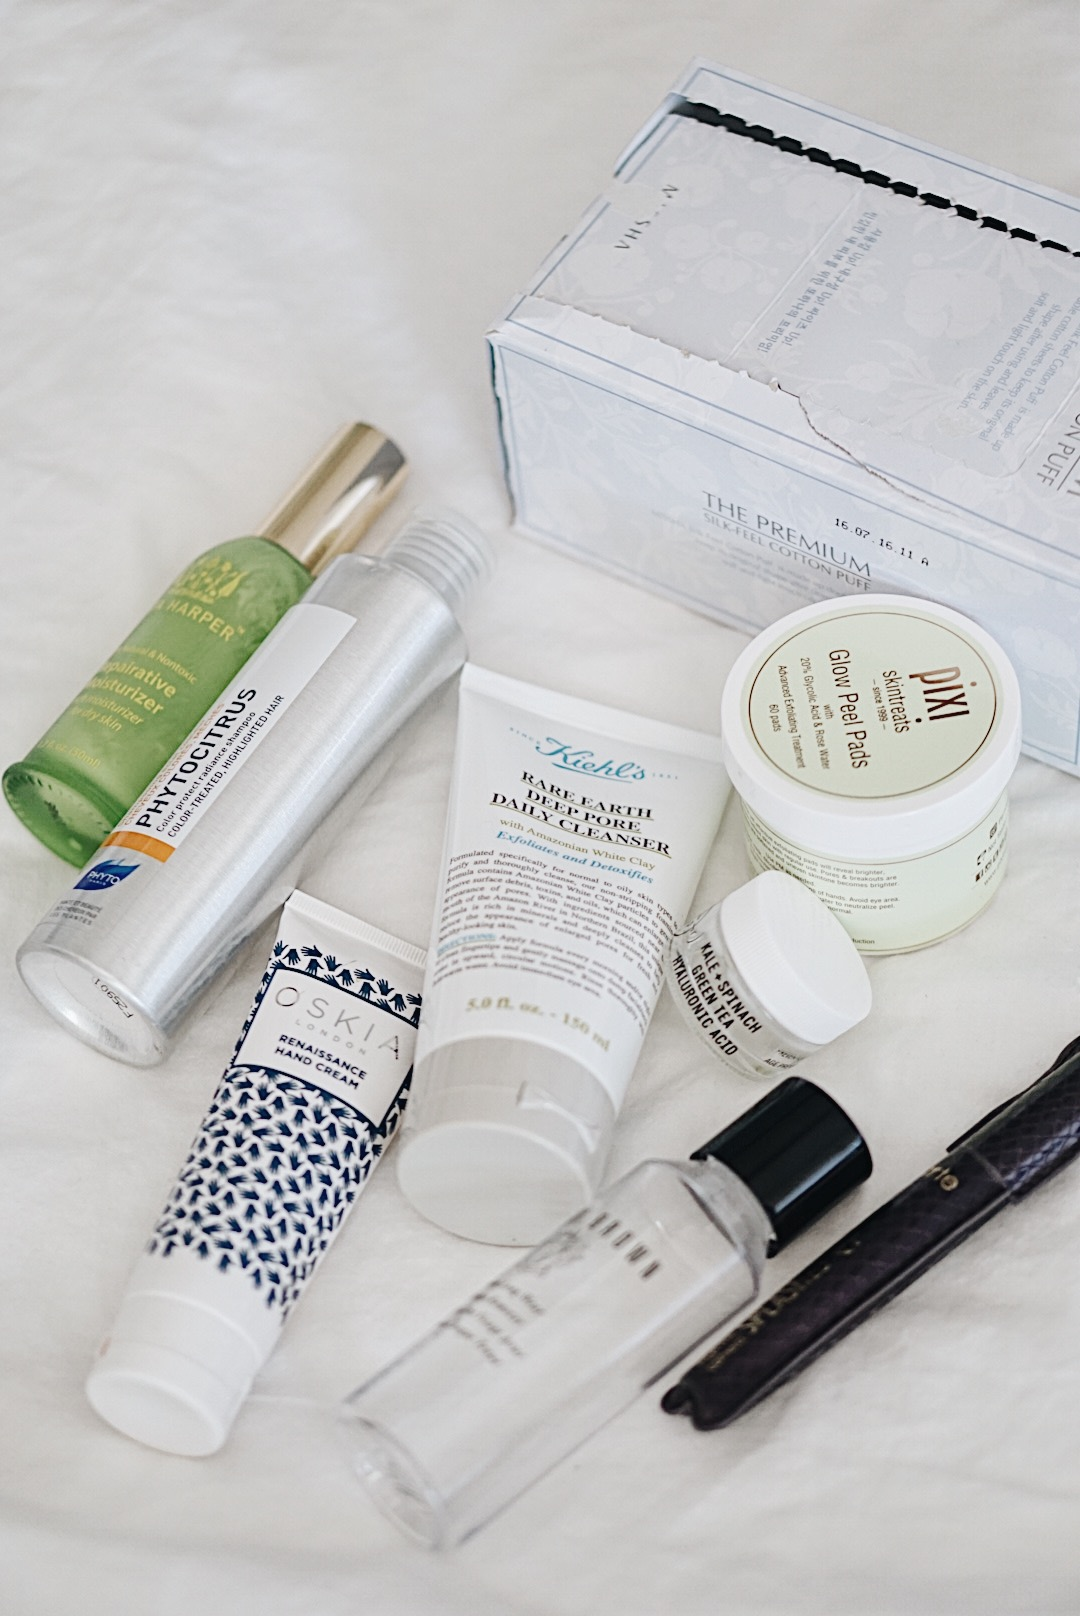 Skincare Empties | Tata Harper, Oskia, Kiehl's, Youth to the People, Tarte, Bobbi Brown